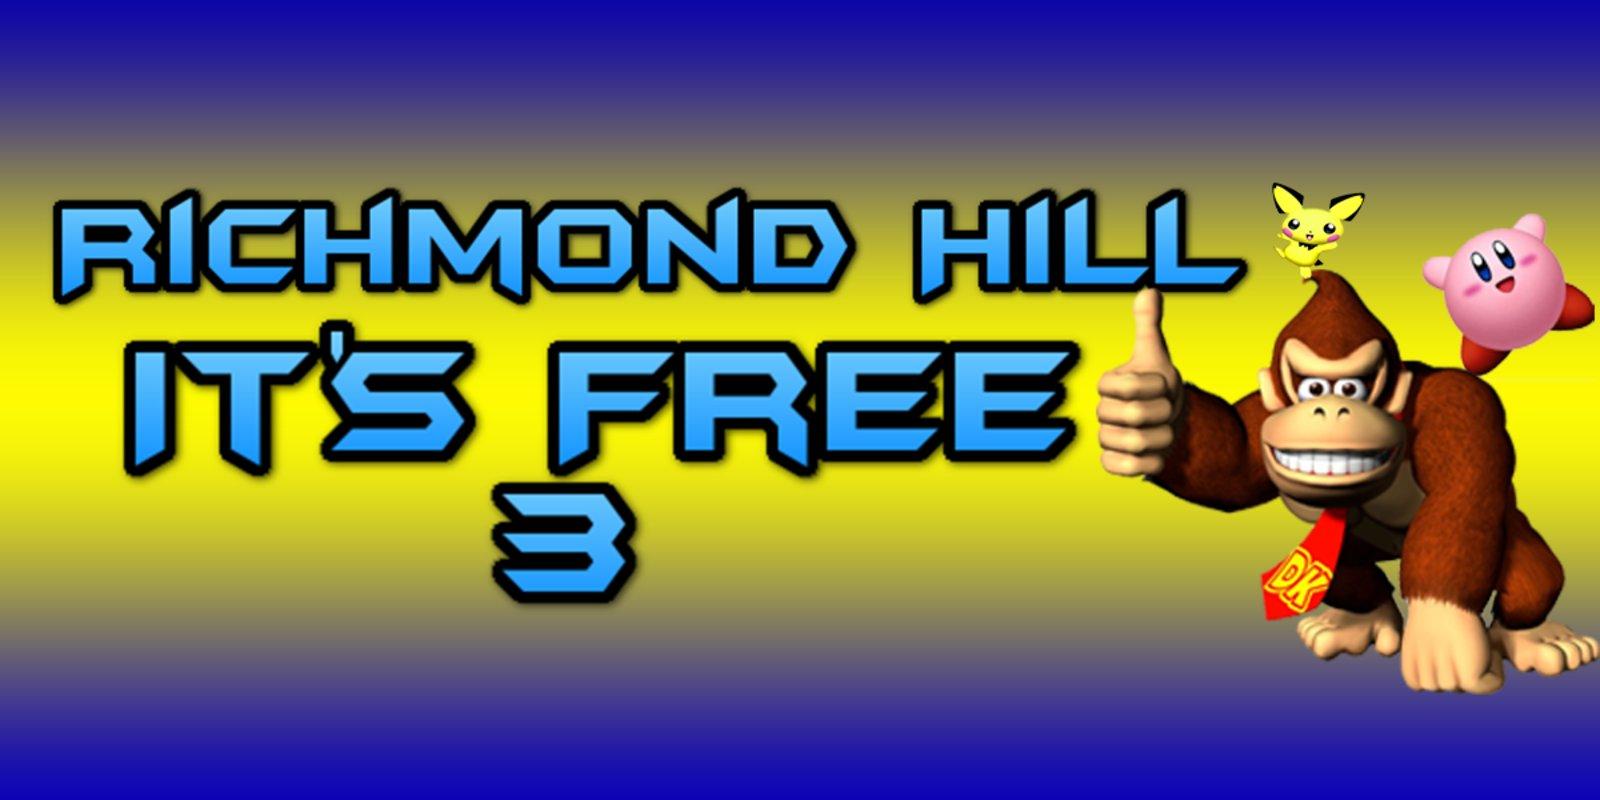 It's Free 3 - Project M Singles